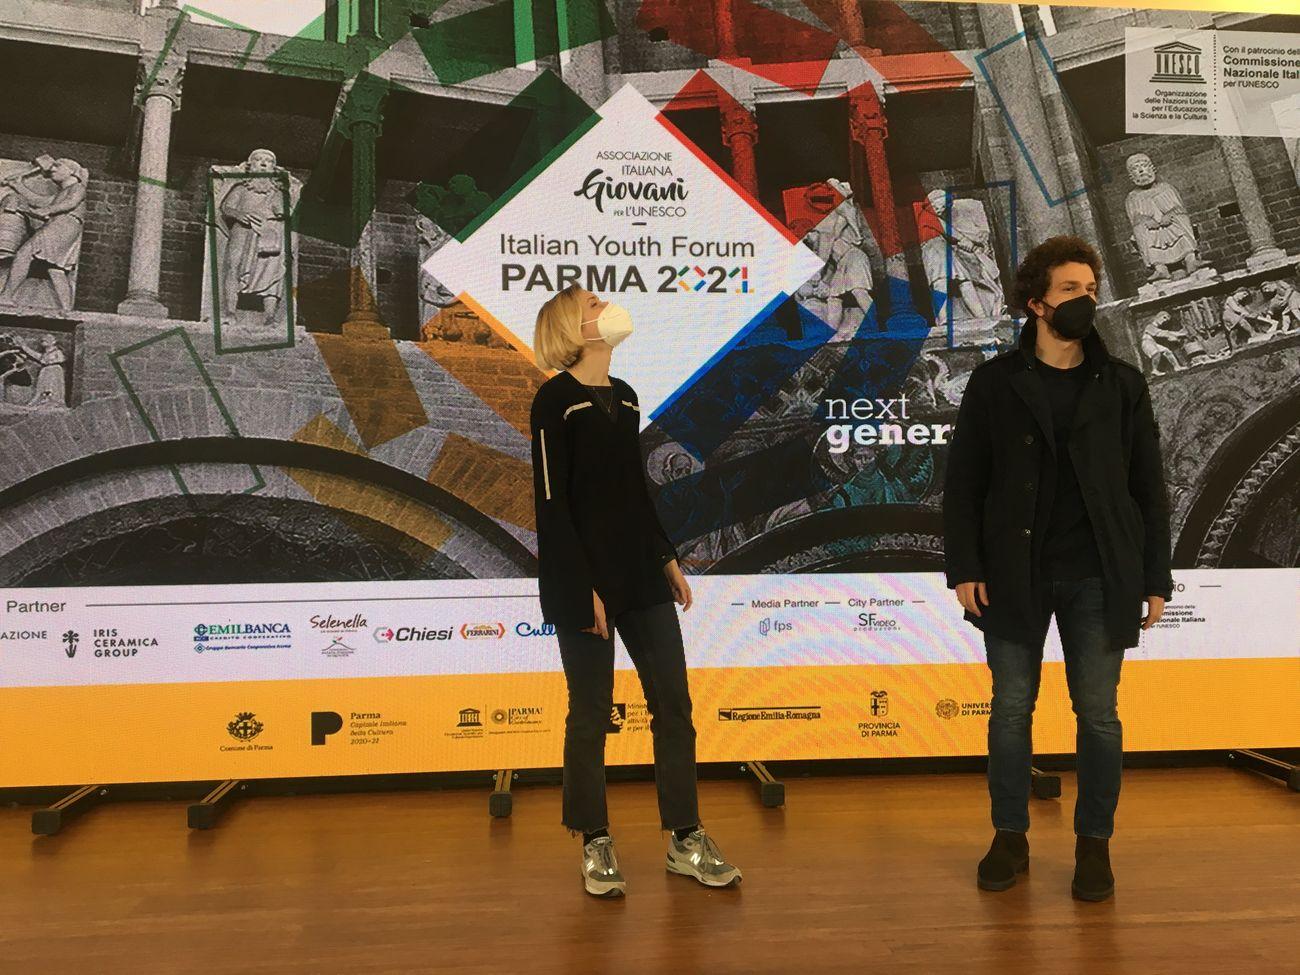 Italian Youth Forum, Parma